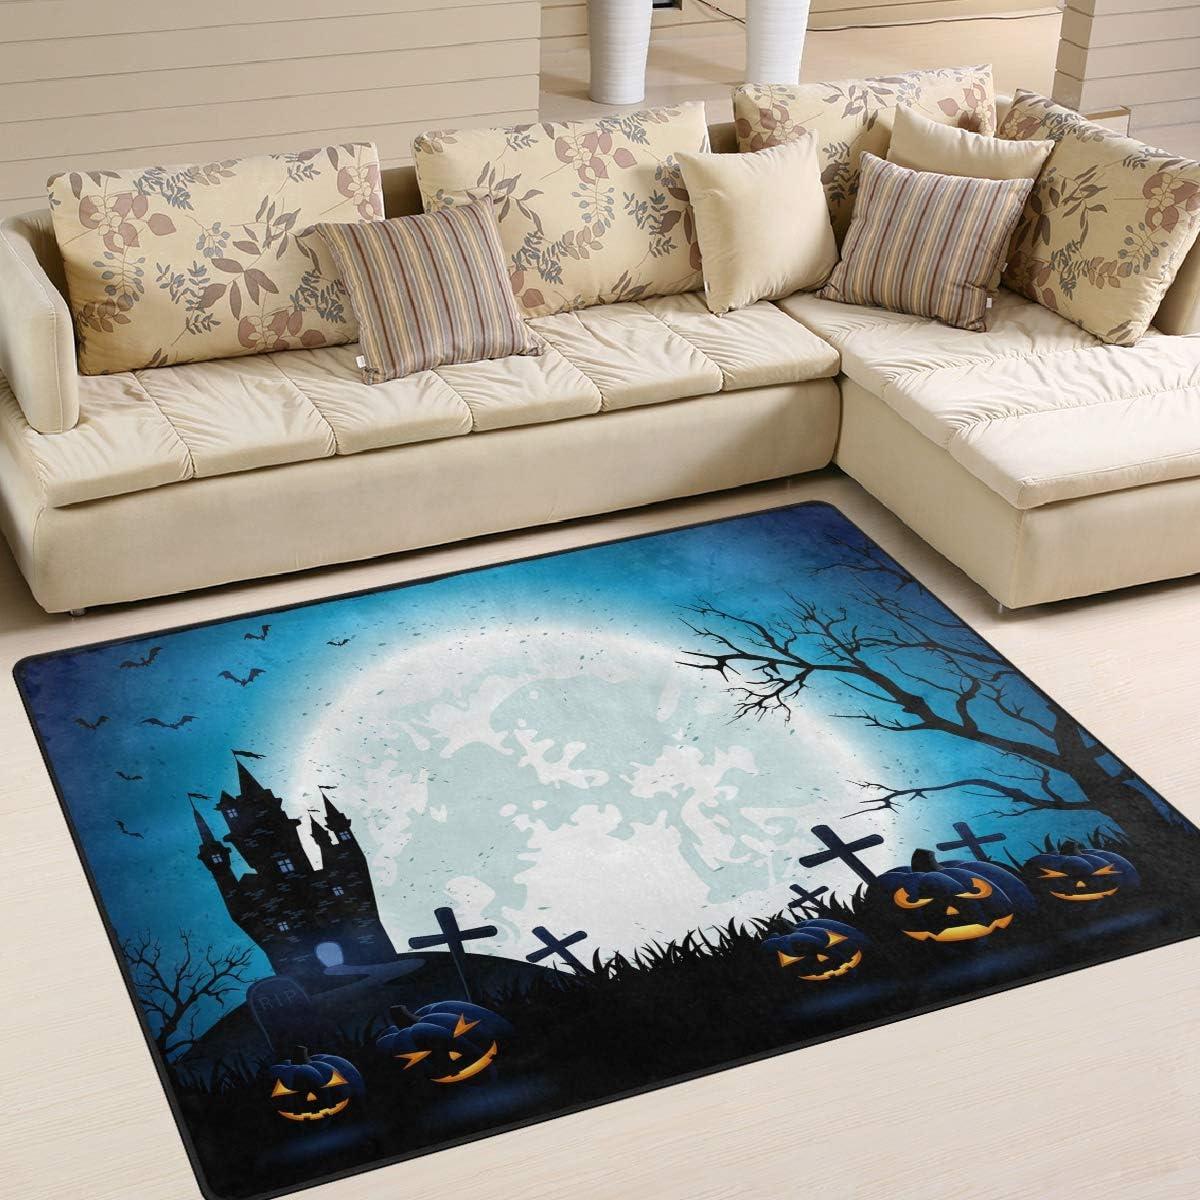 Mnsruu Halloween Moon Night House Forest Bat Pumpkin Area Rug Rugs For Living Room Bedroom 203cm X 147 3cm 7 X 5 Feet Amazon Co Uk Kitchen Home